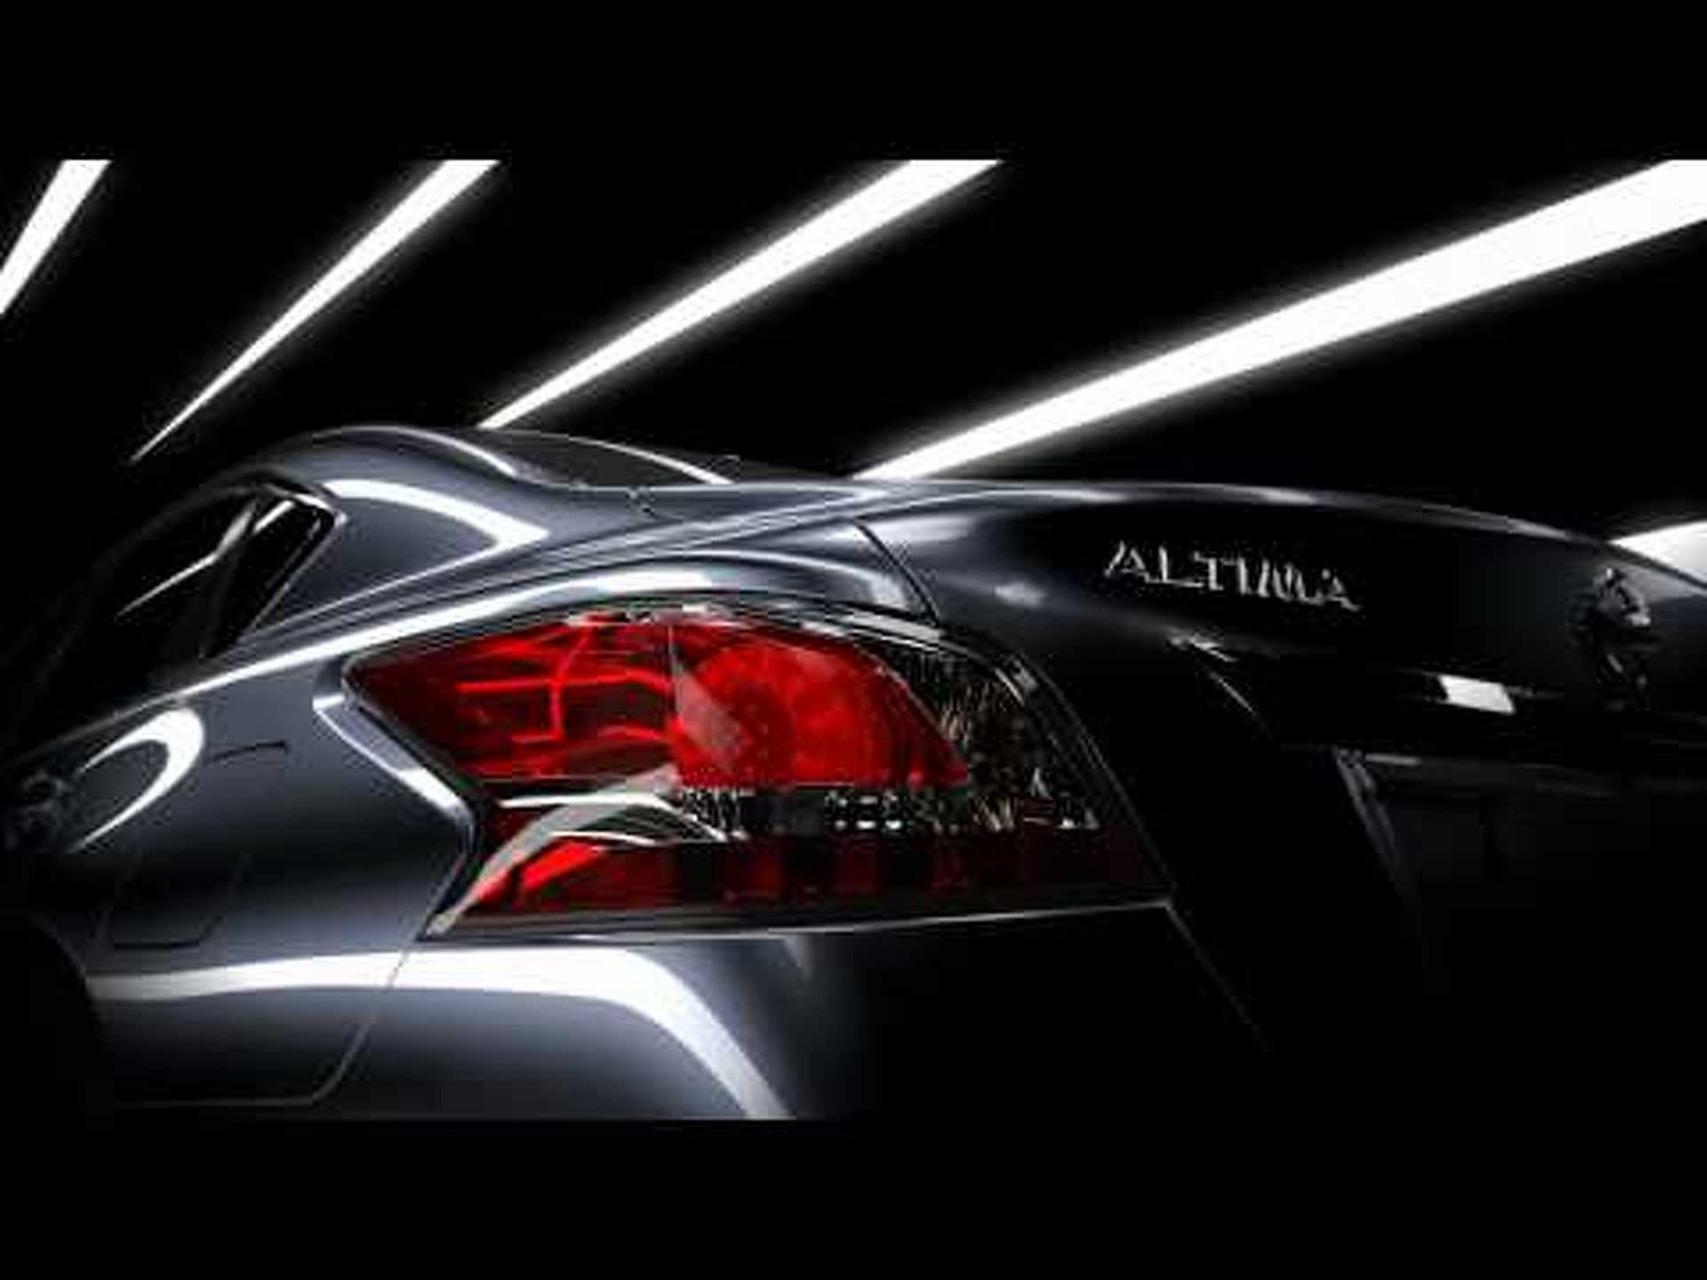 2013 Nissan Altima Teaser - Rear